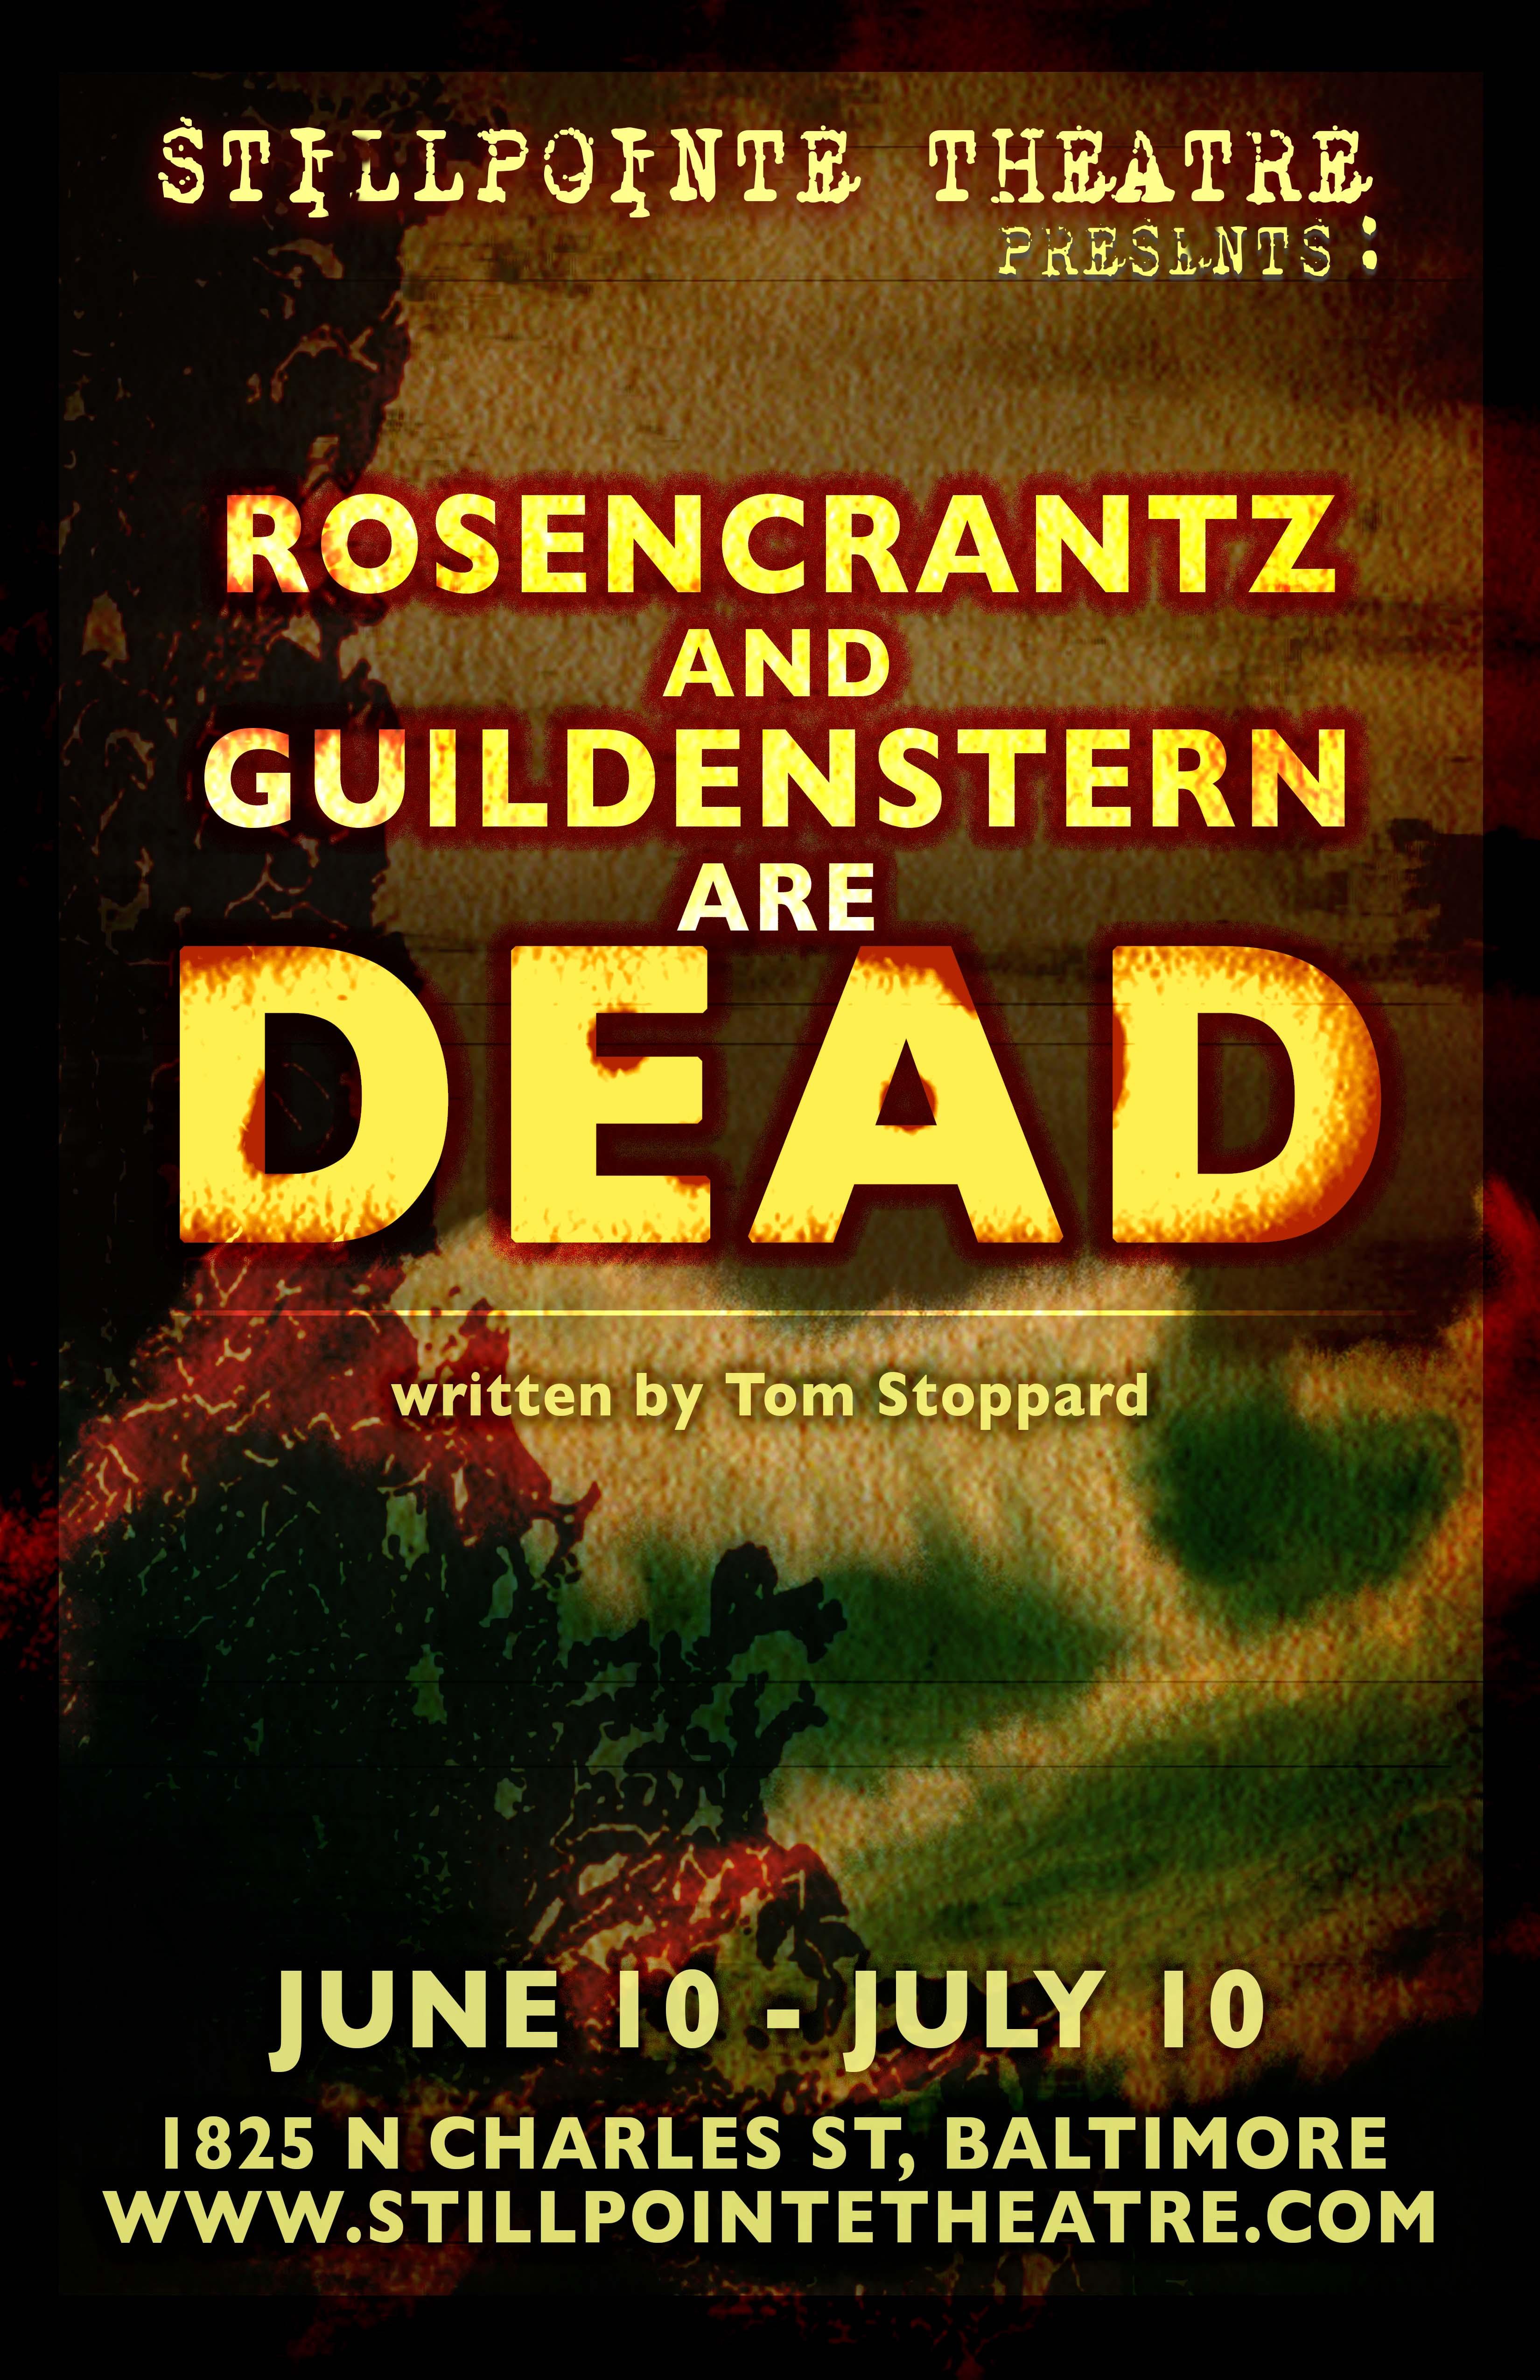 ROSENCRANTZ & GUILDENSTERN ARE DEA